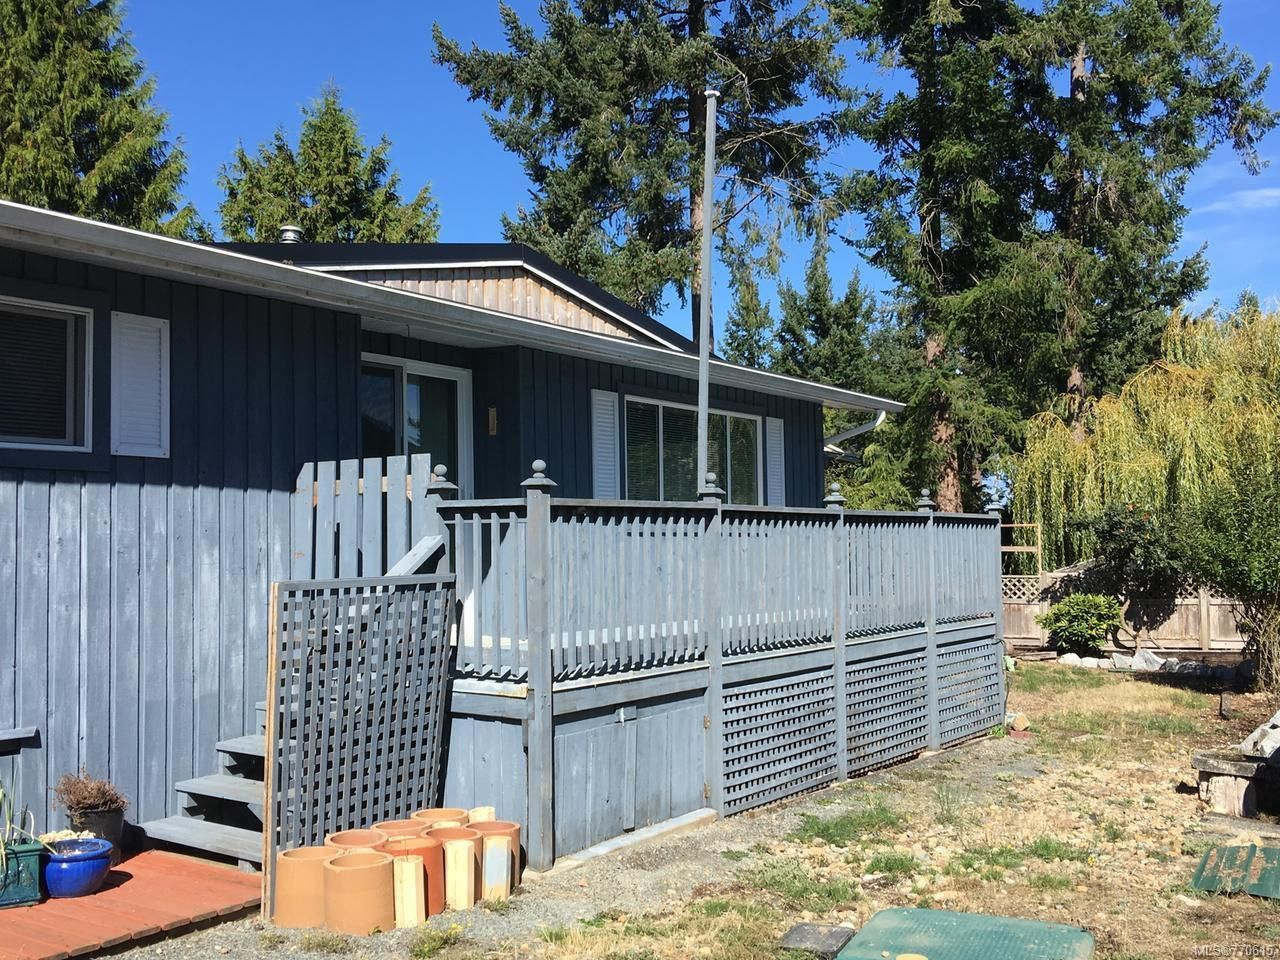 Main Photo: 1404 Pilot Way in NANOOSE BAY: PQ Nanoose House for sale (Parksville/Qualicum)  : MLS®# 770615